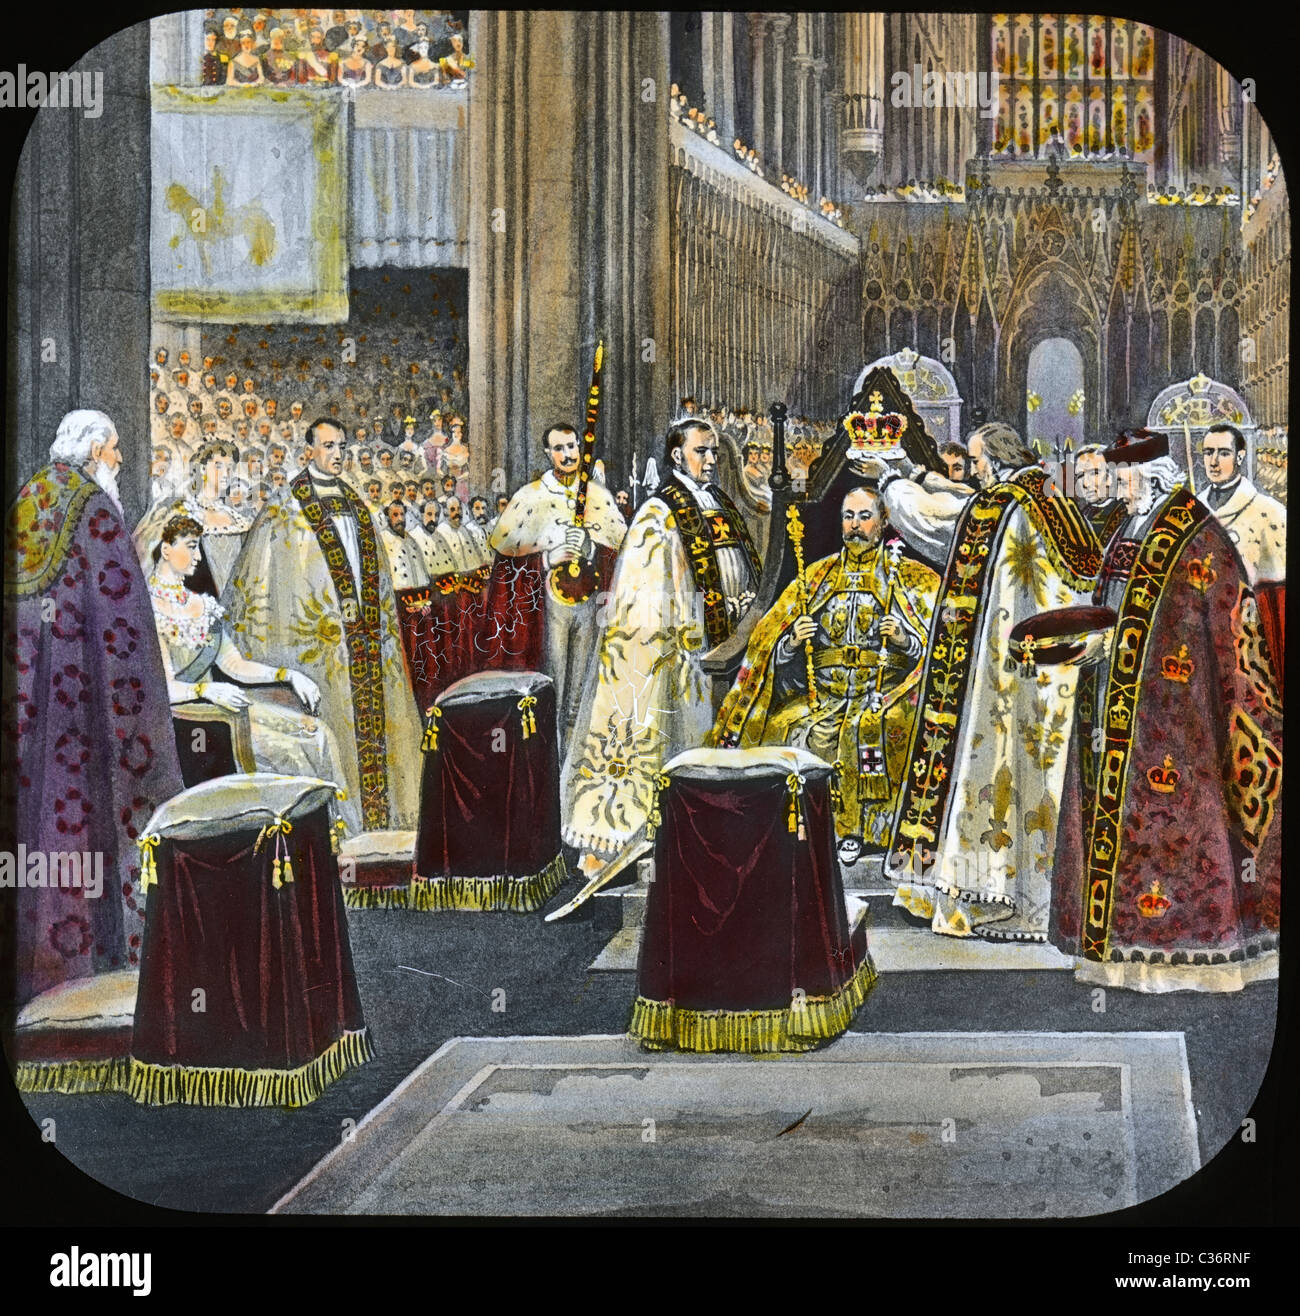 Circa 1901 hand-colored illustration of the coronation of Edward VII. - Stock Image